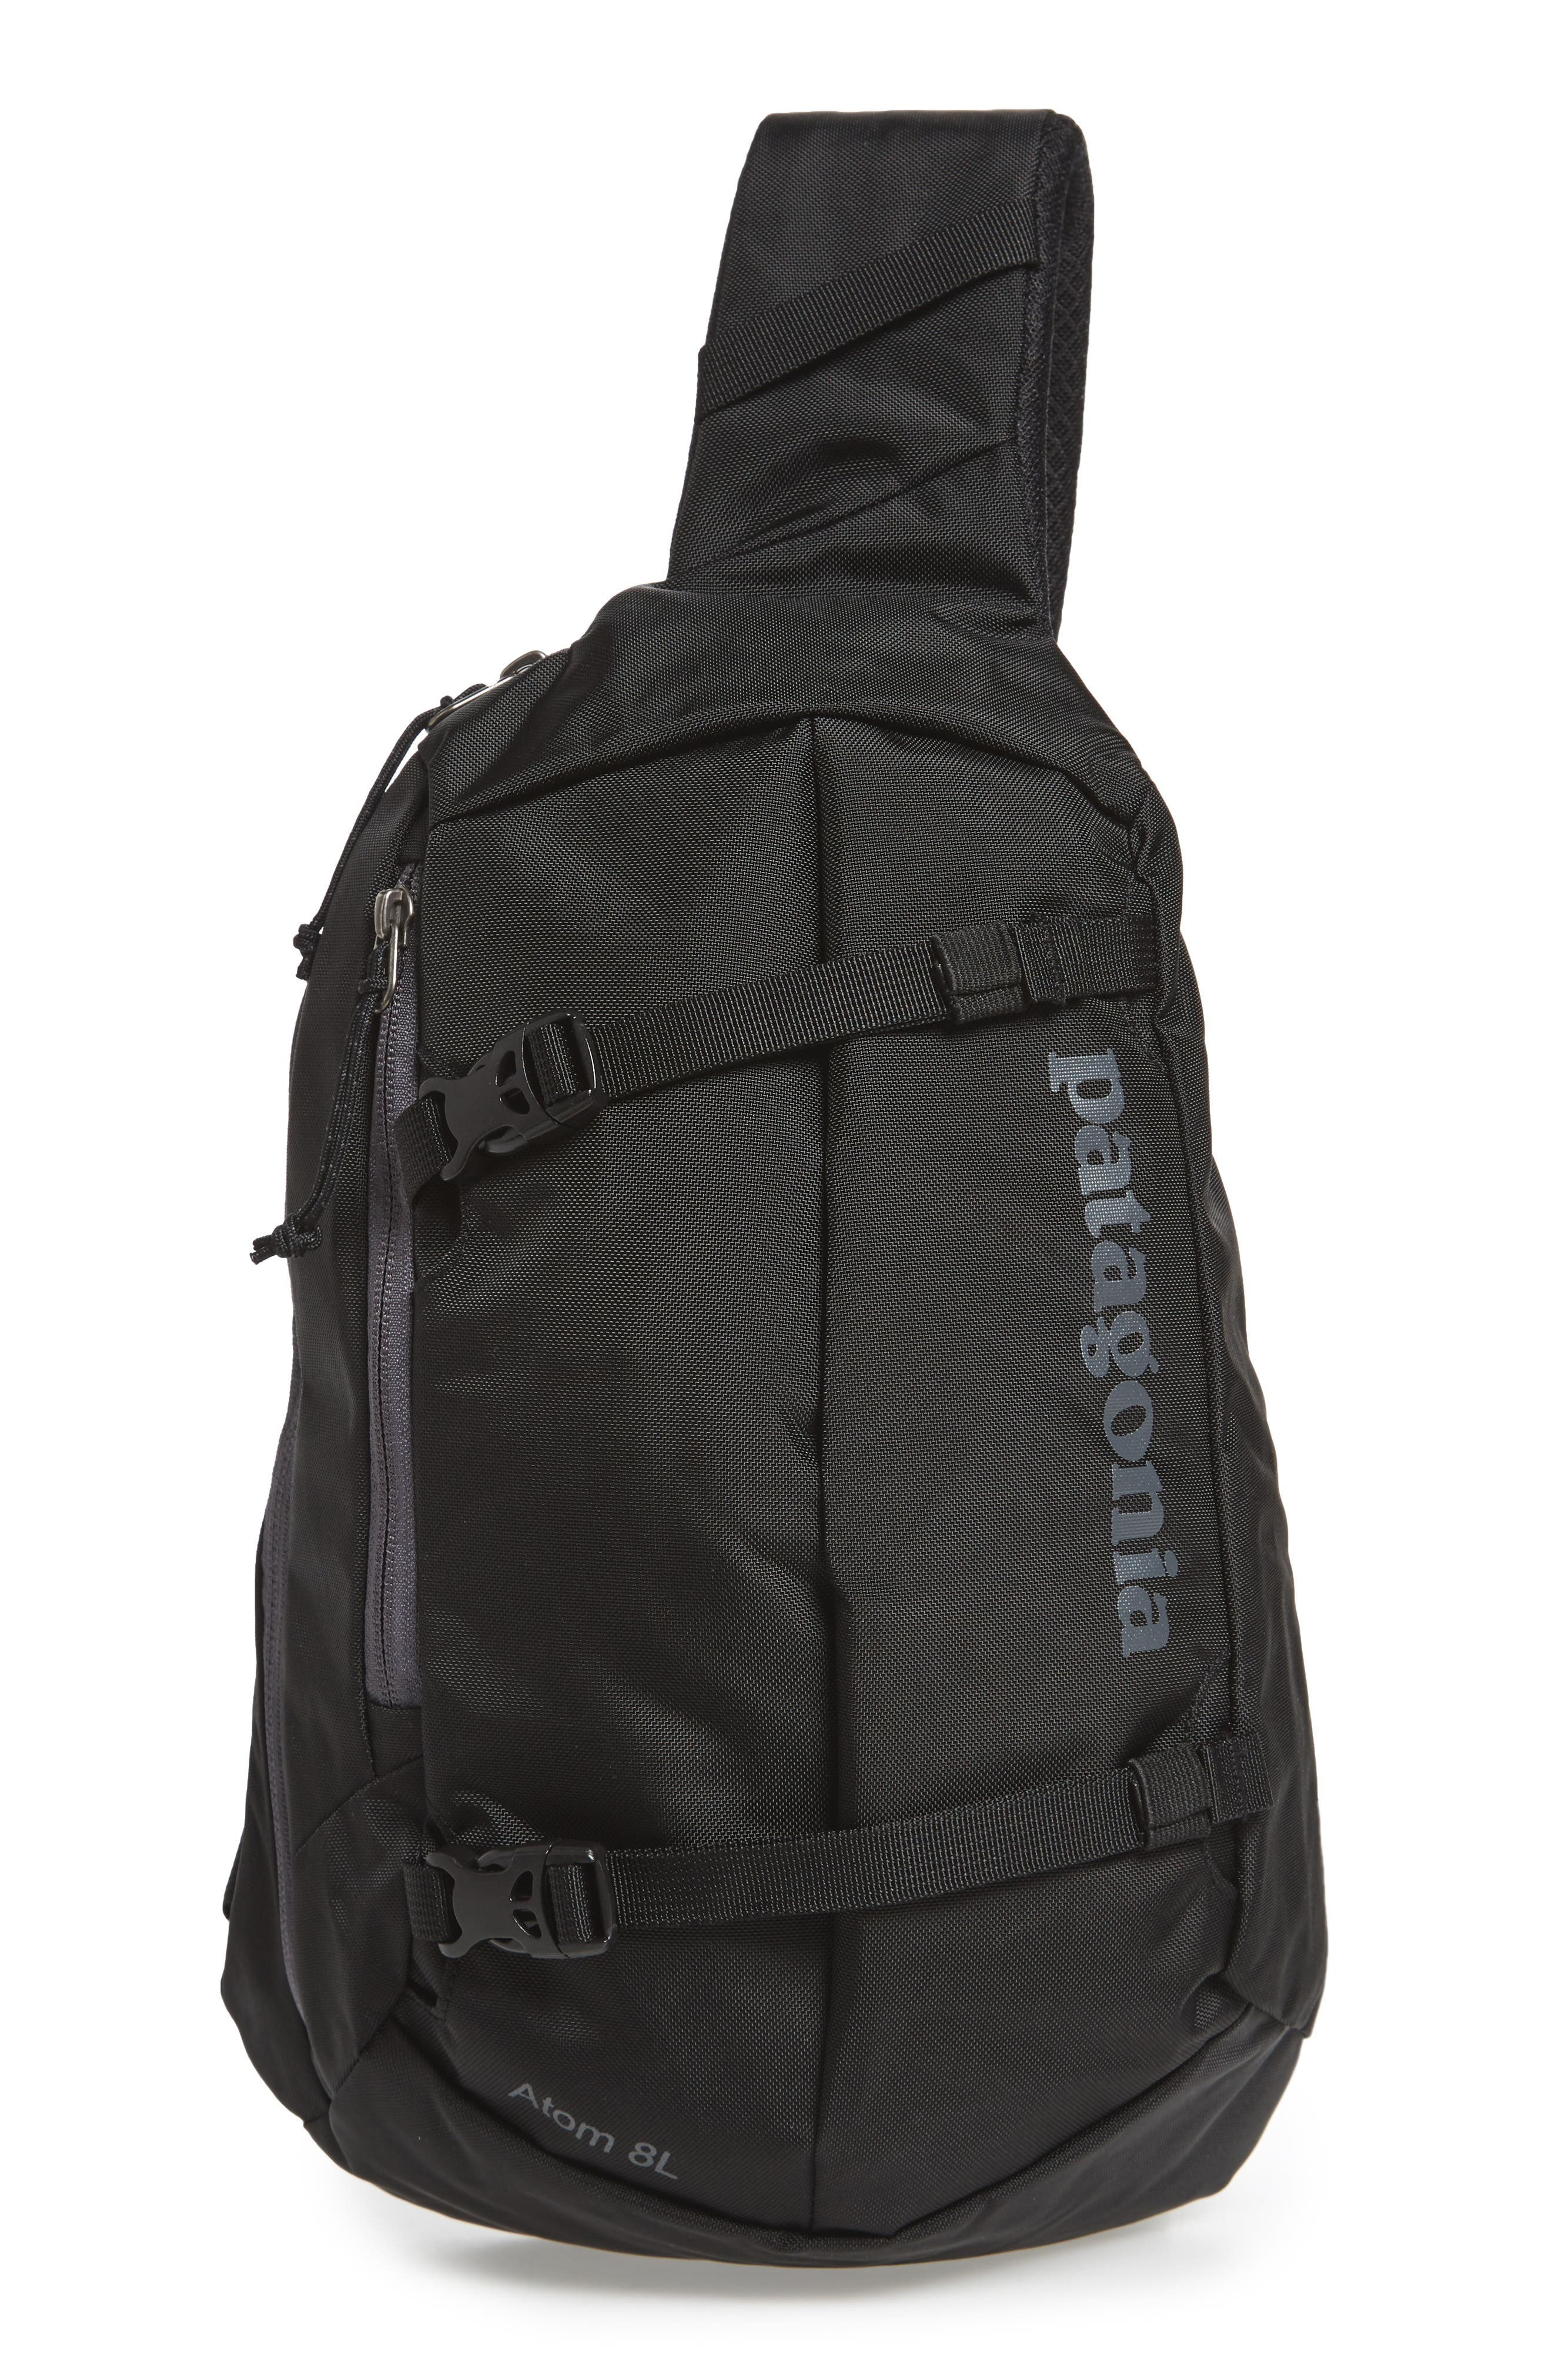 PATAGONIA, Atom 8L Sling Backpack, Main thumbnail 1, color, BLACK